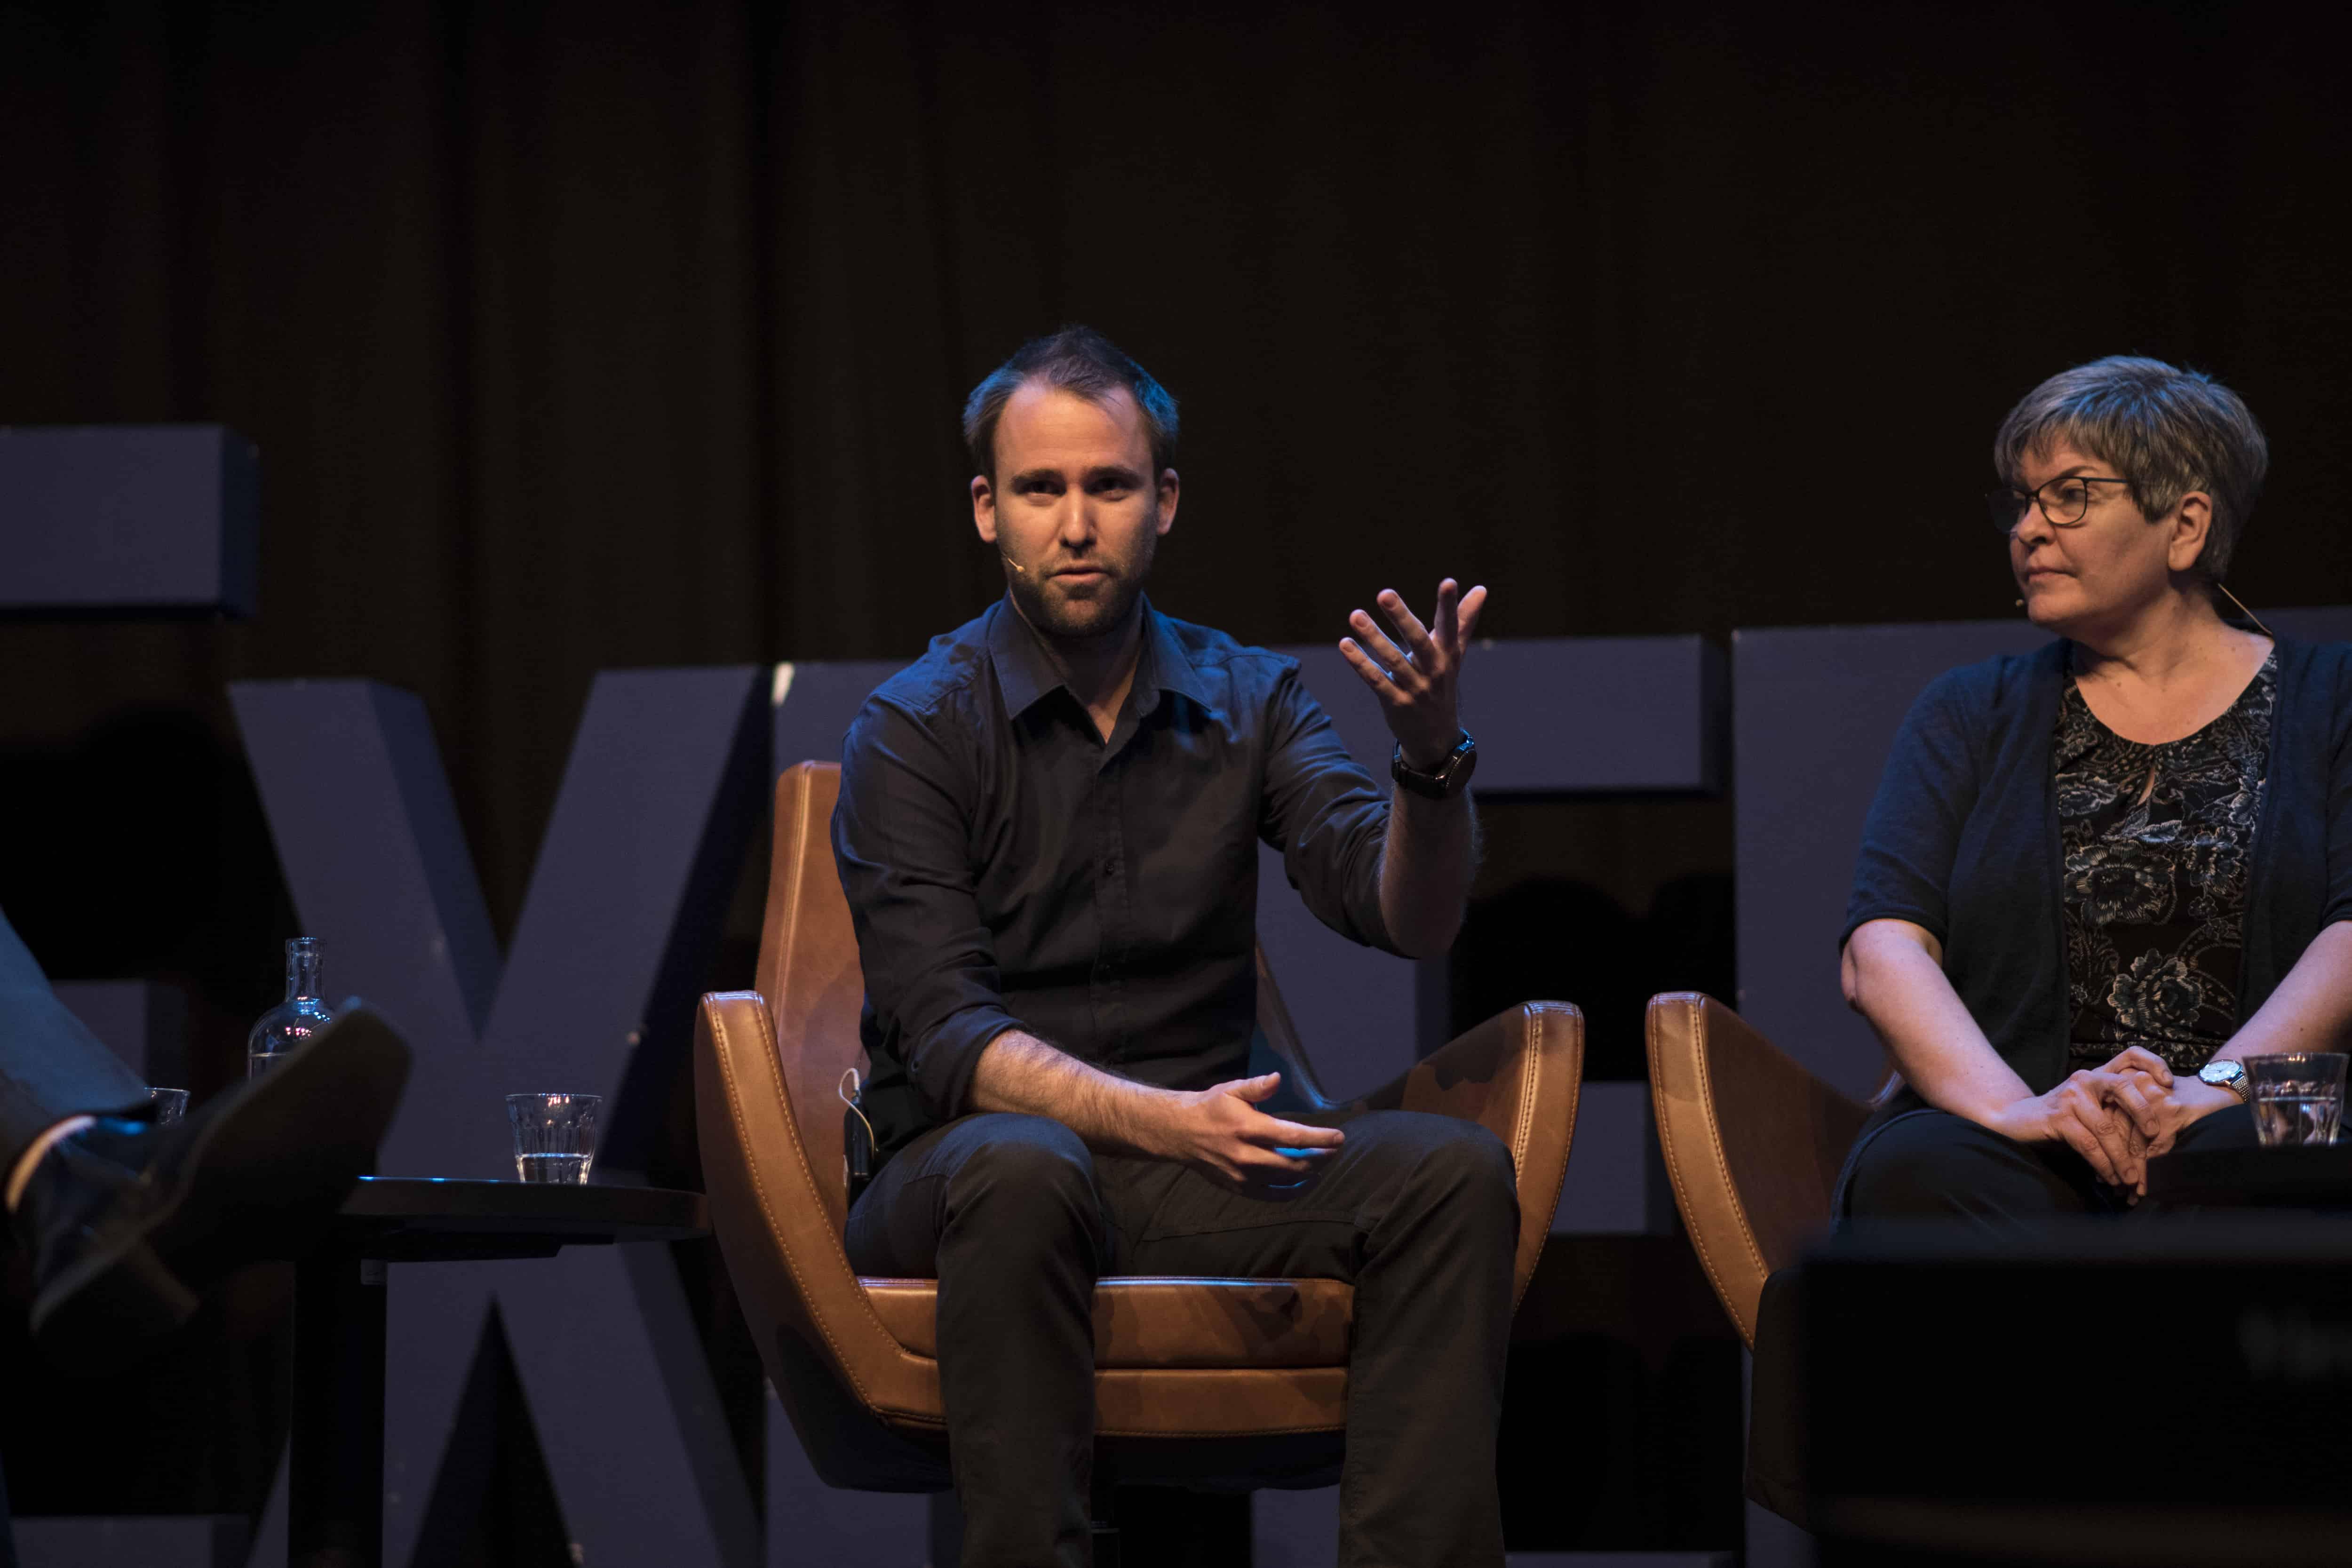 Experts Live Tech Panel Keynote Thomas Maurer